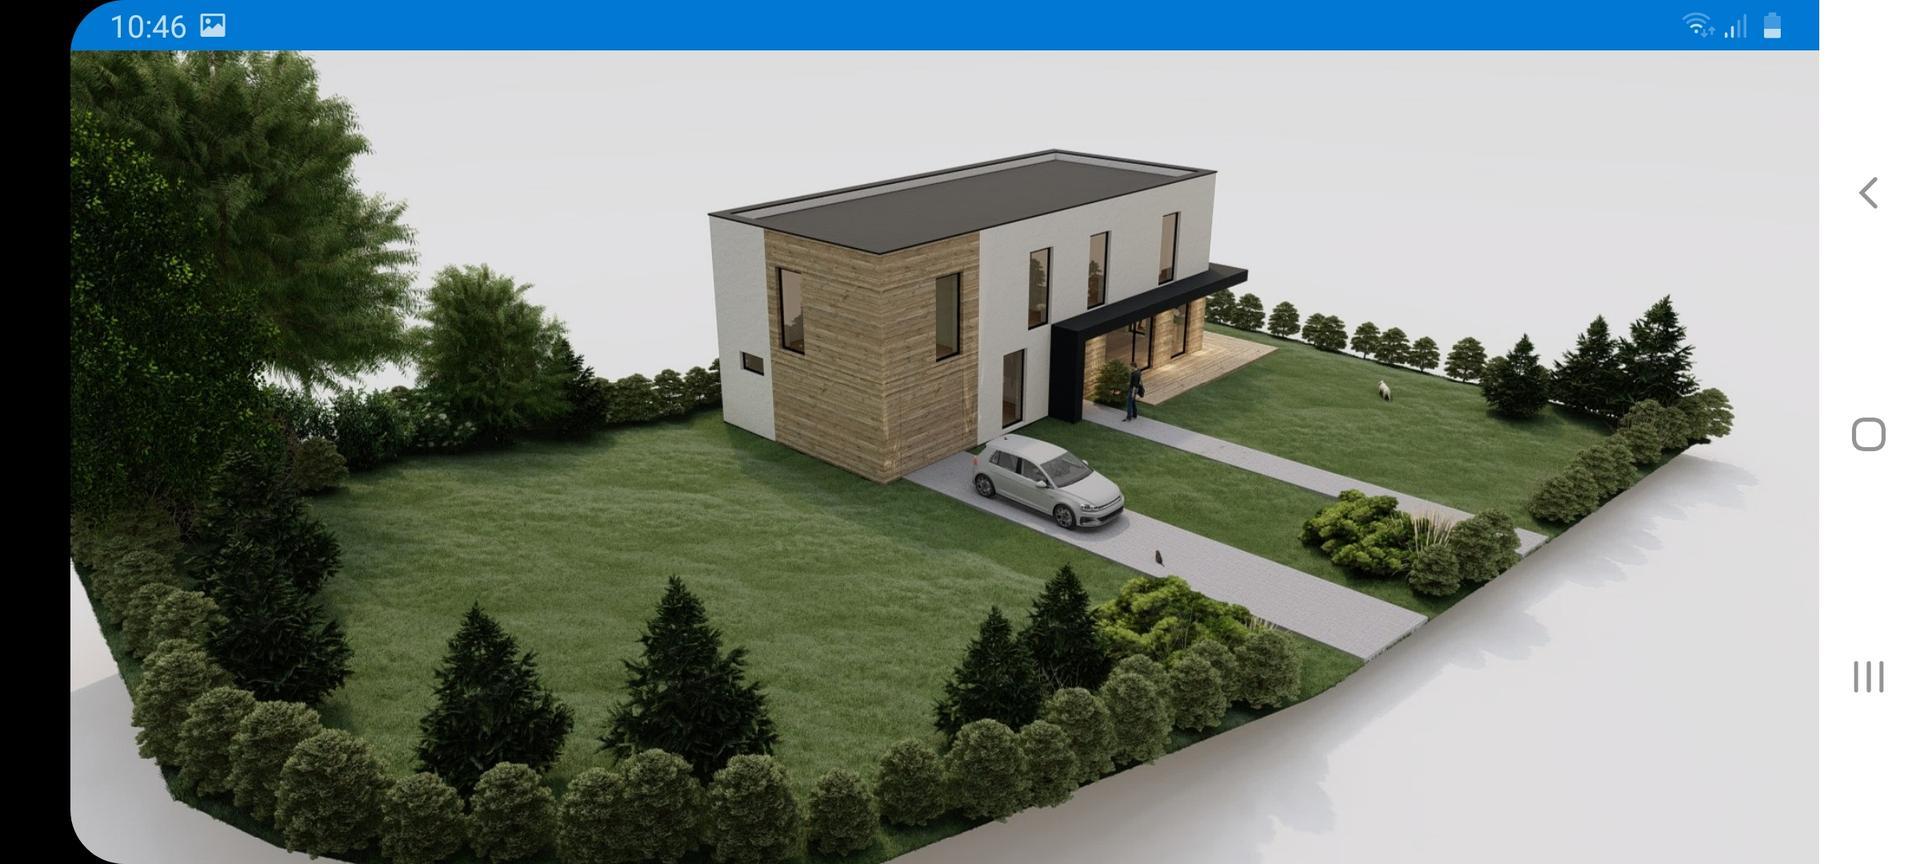 Náš budúci domček 🥰❤ - Obrázok č. 2